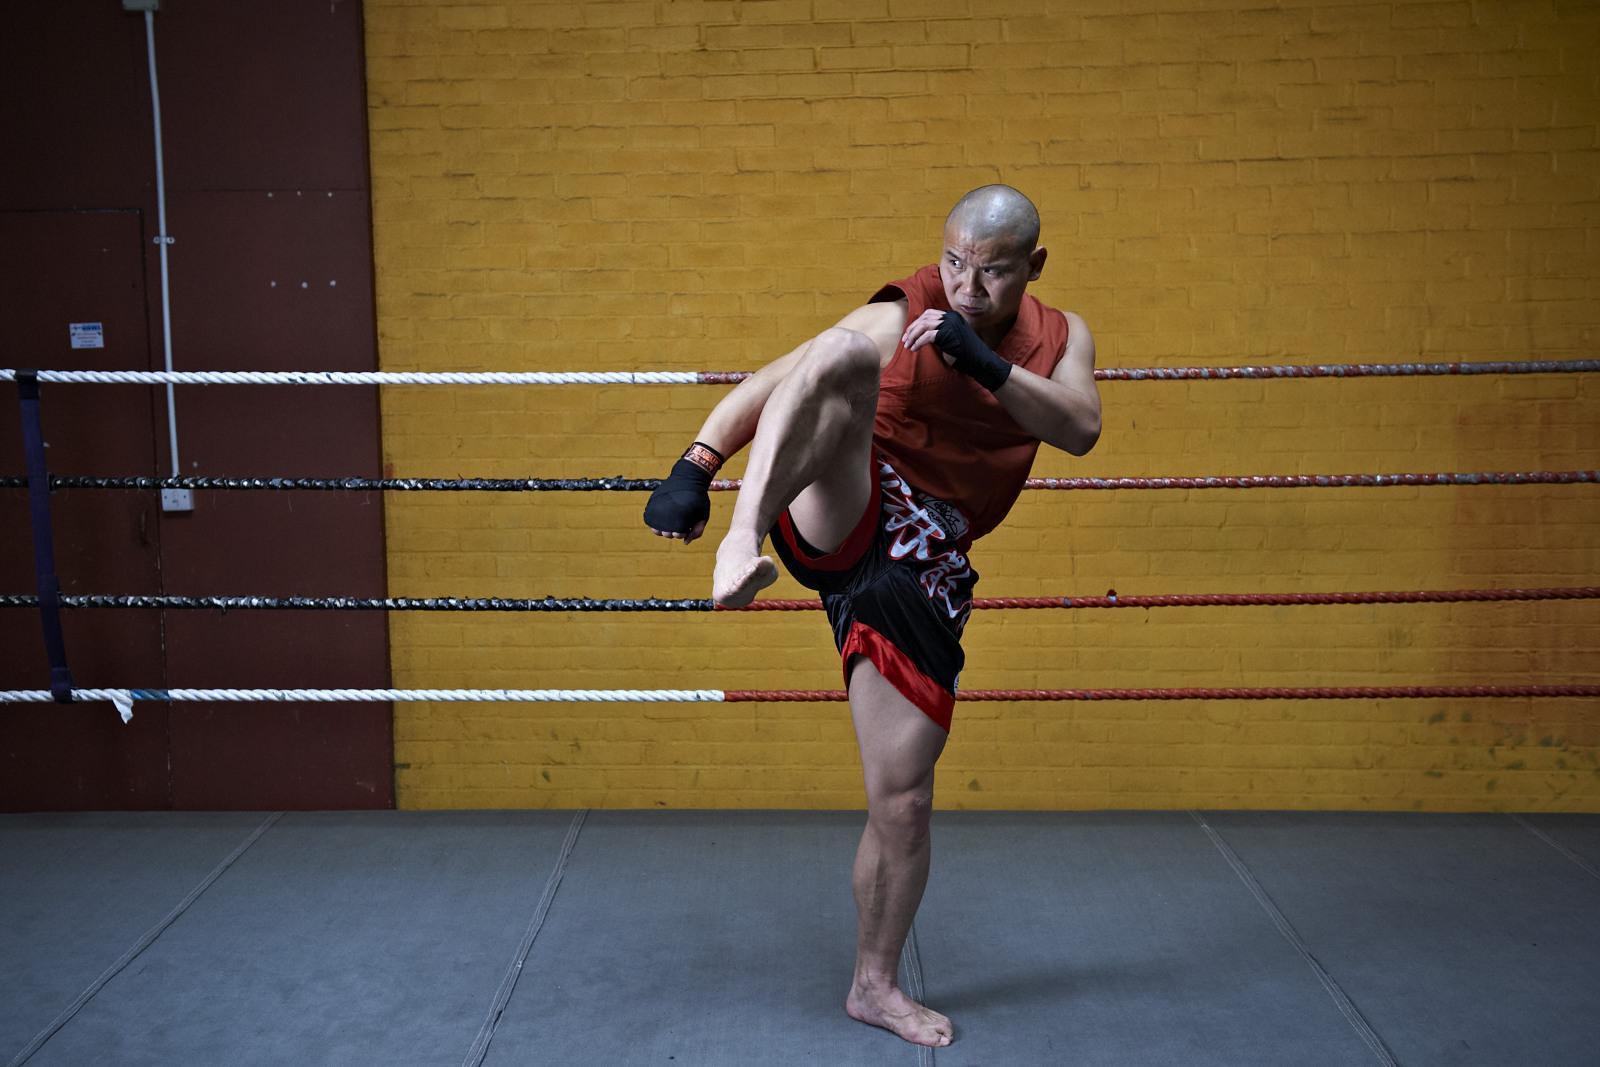 Shaolin temple uk shifu yanzi kick 11.jpg